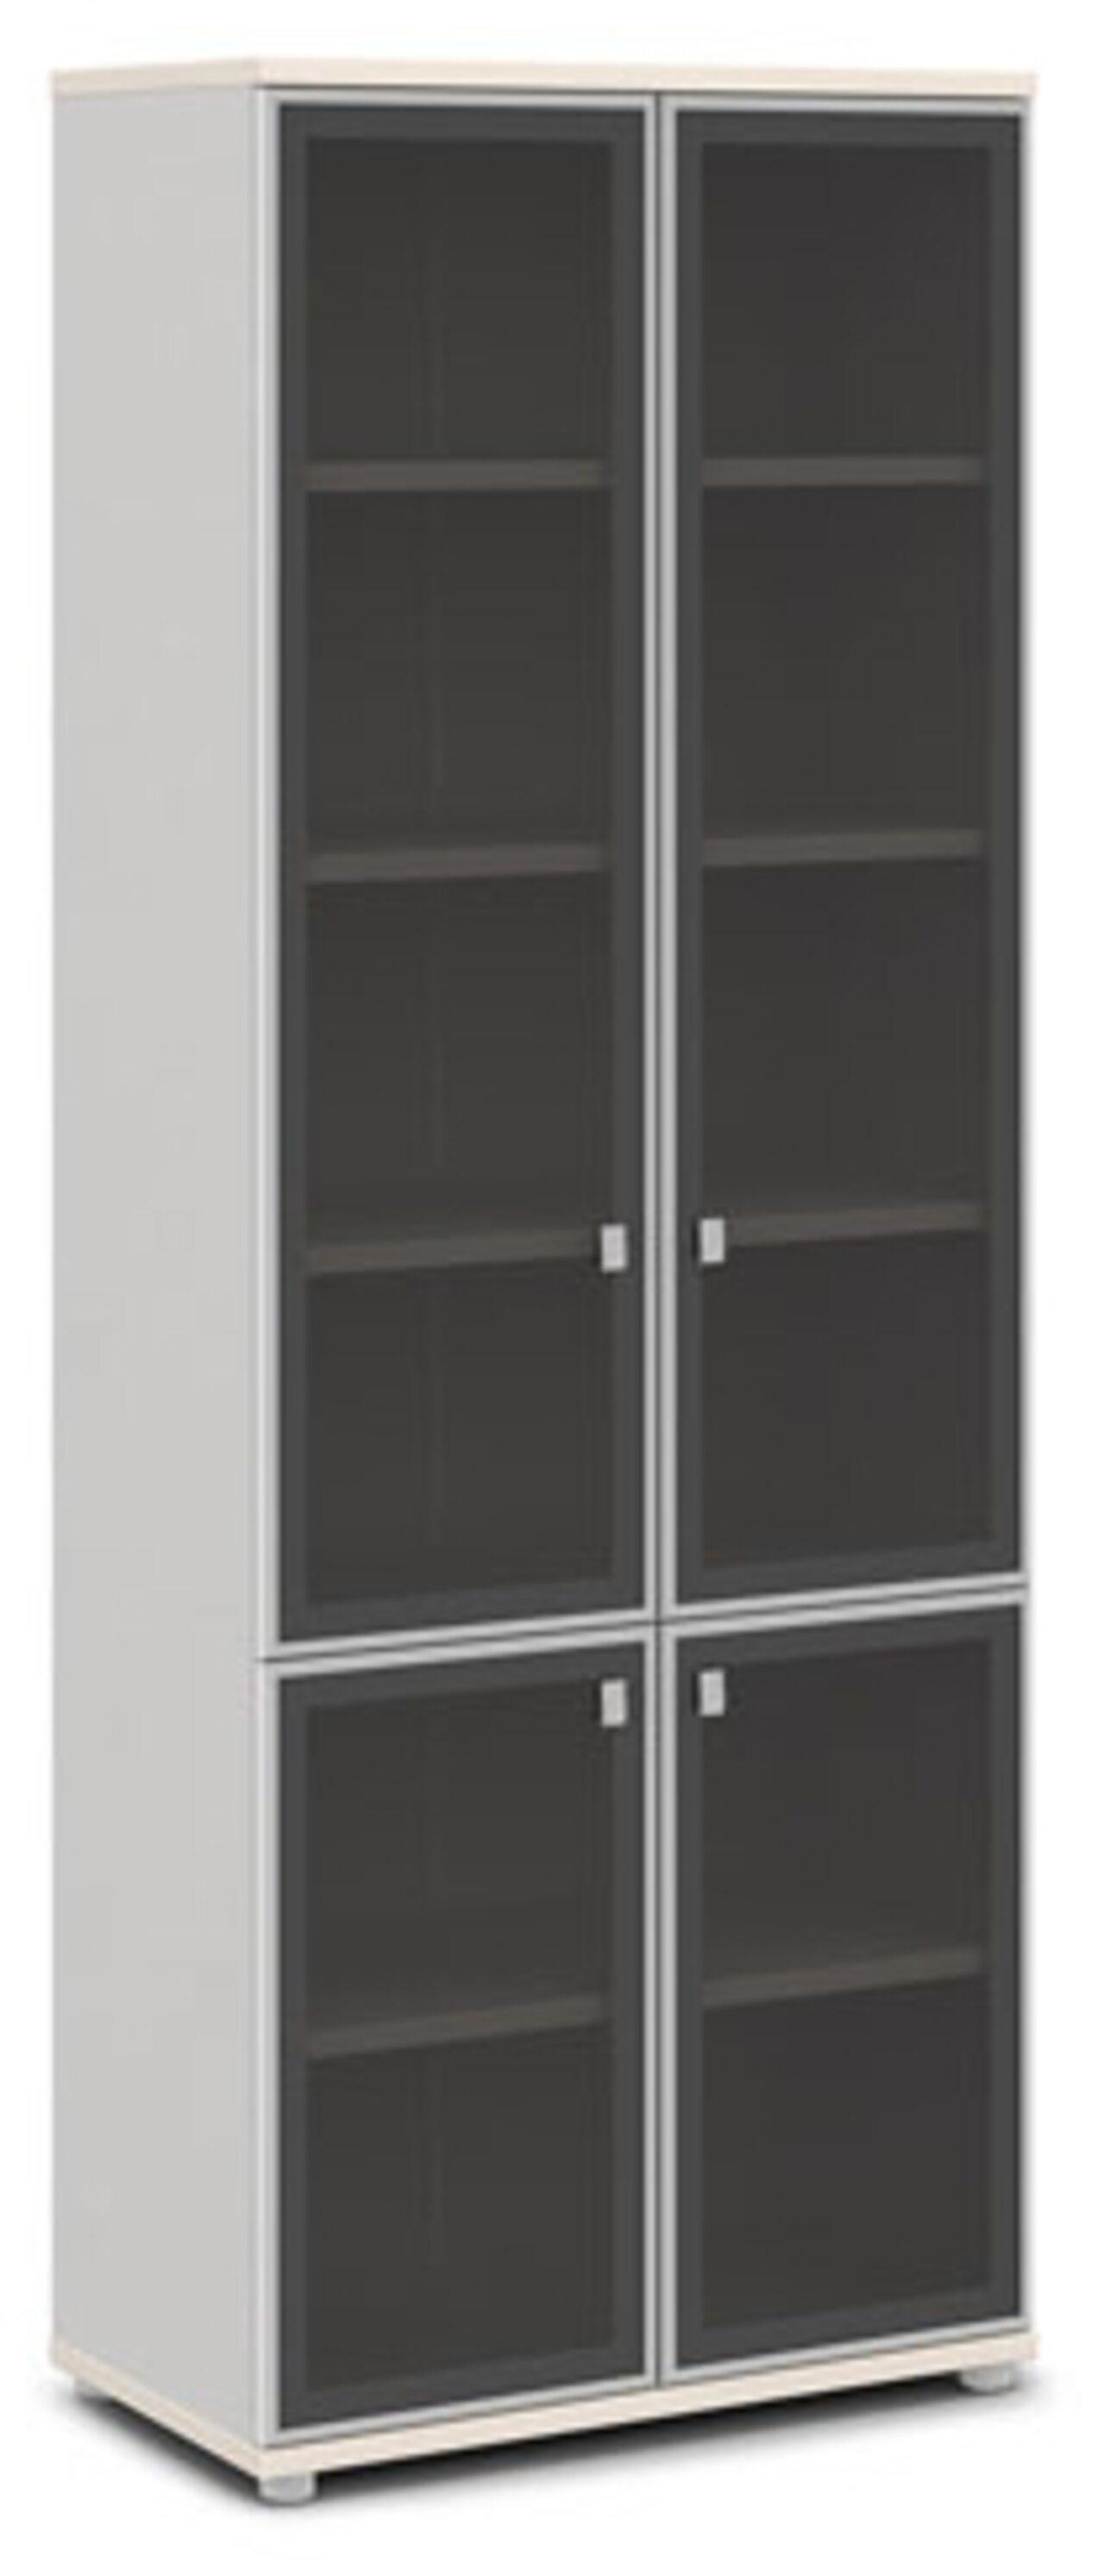 Шкаф со стеклом в алюминиевом профиле  Vasanta 82x44x220 - фото 7